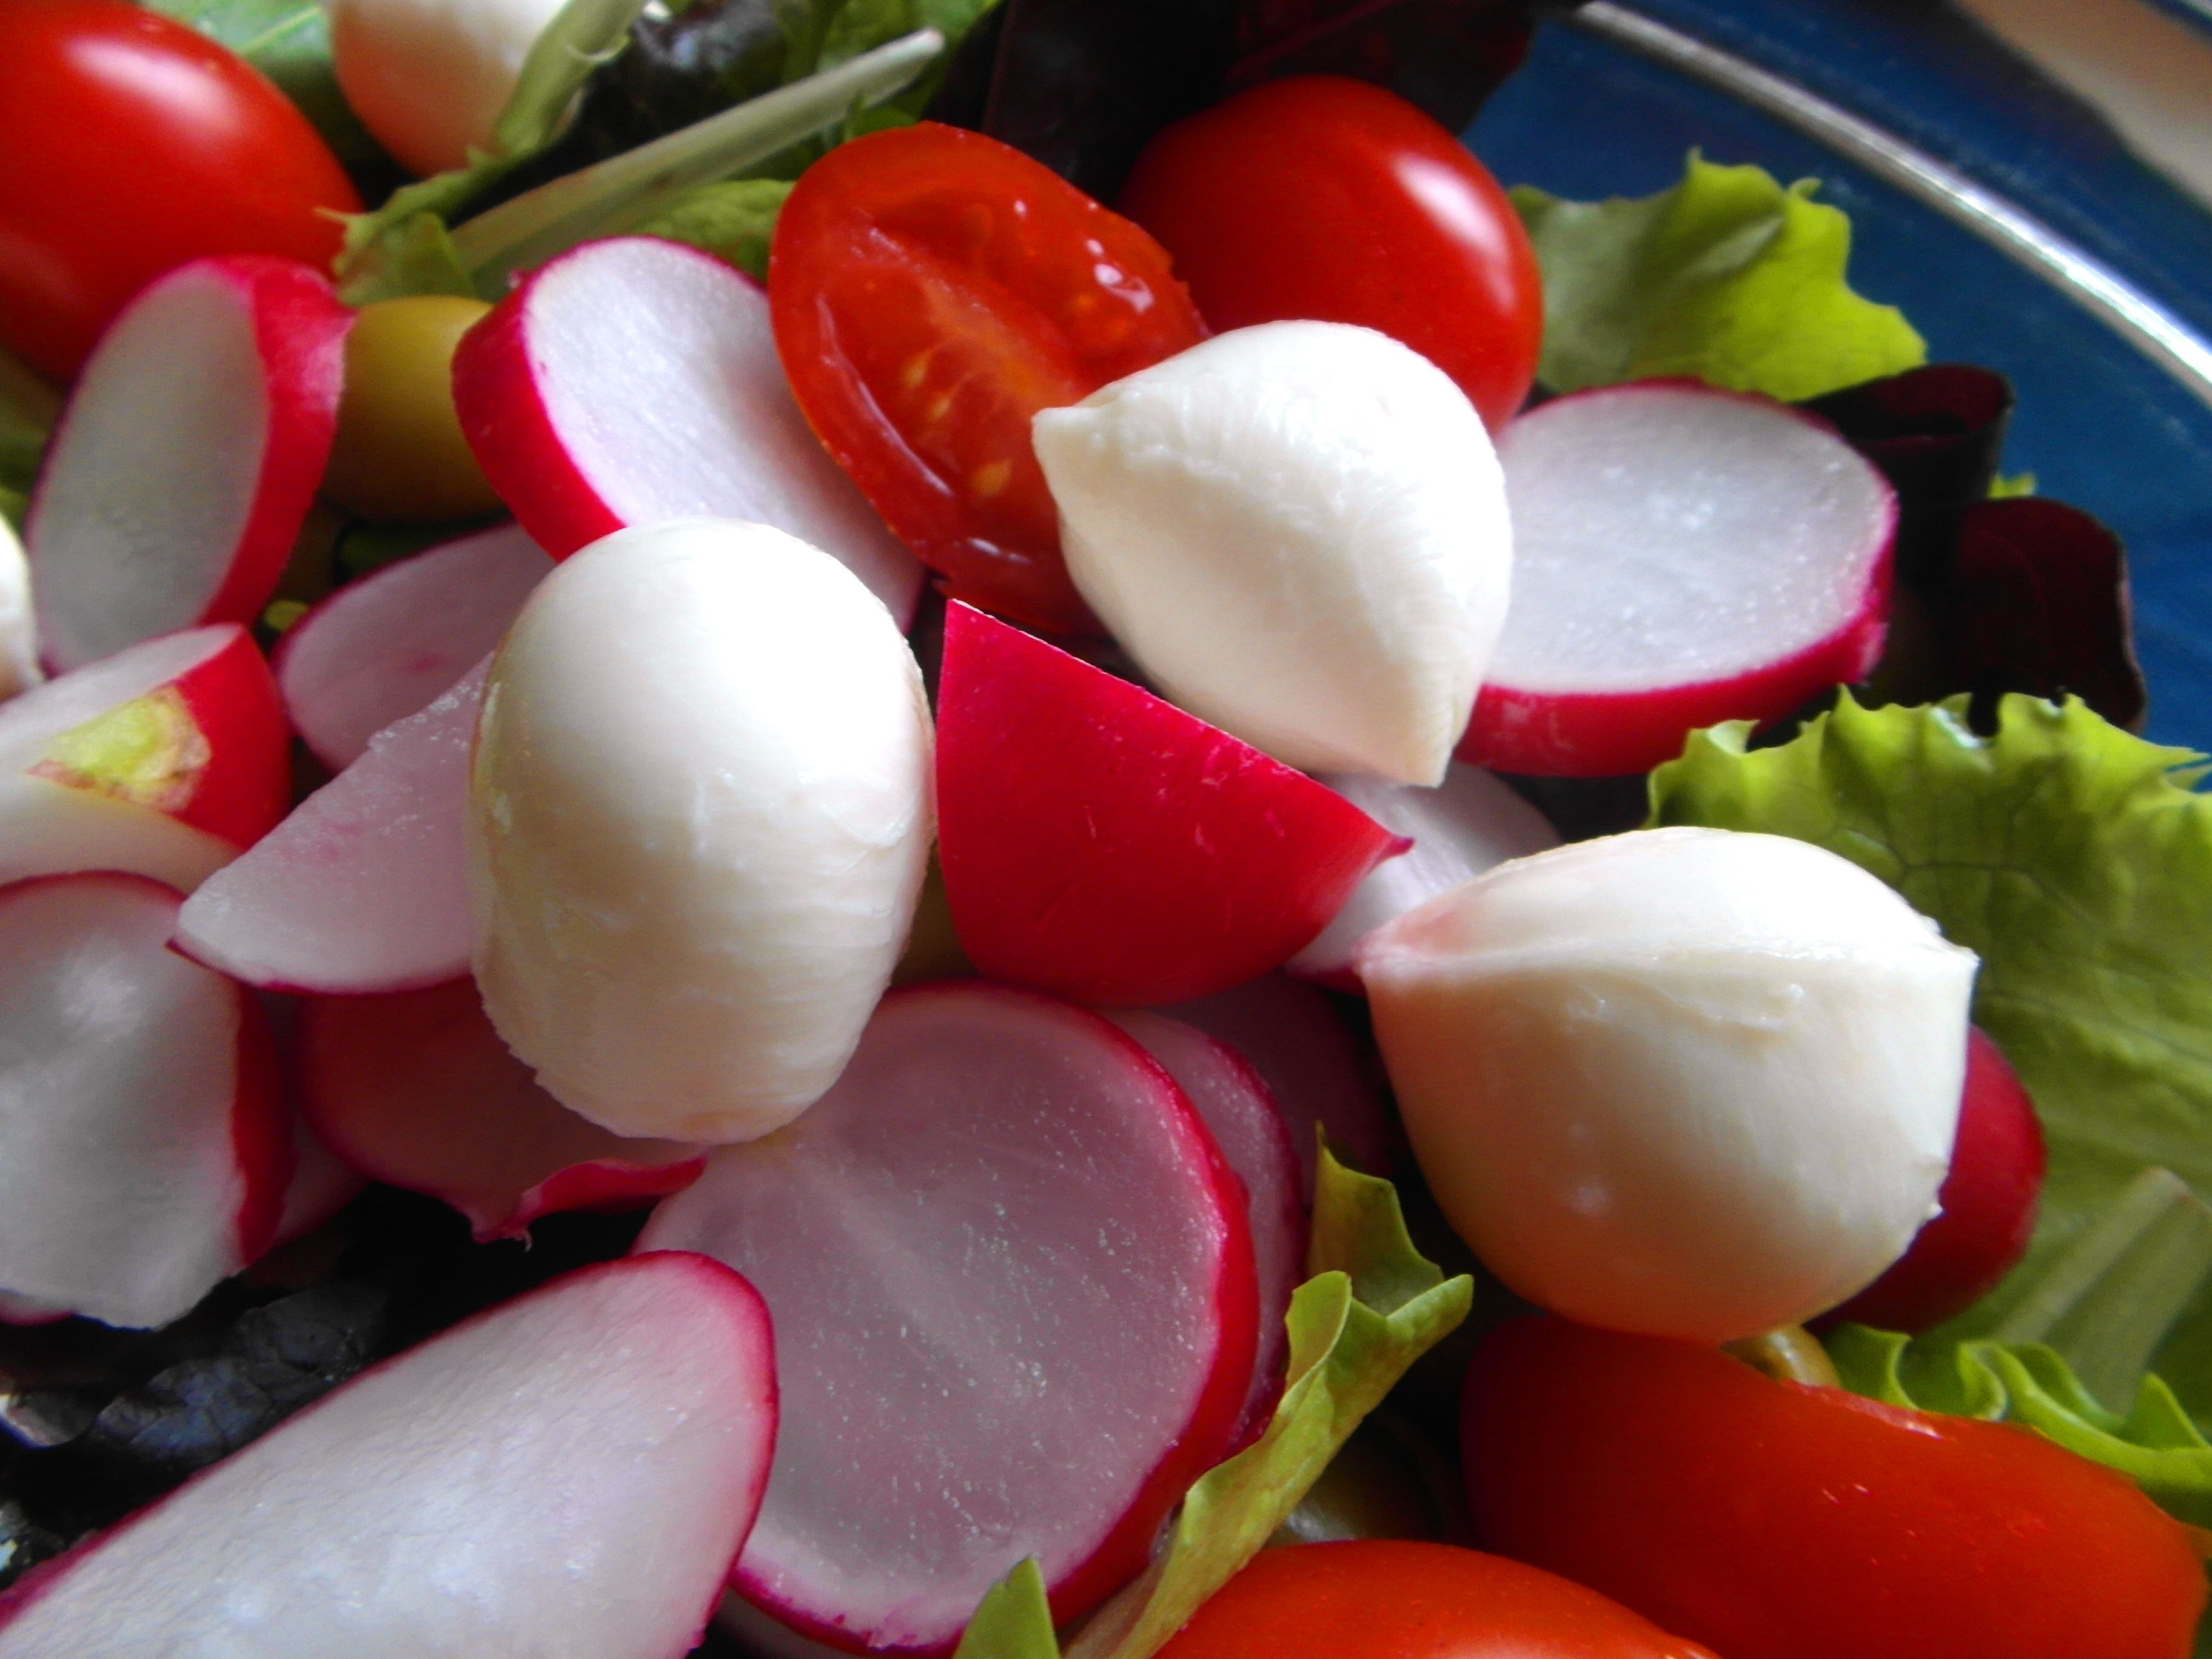 Pripravte si zeleninový šalátik s mozarellou a k tomu ochutnajte talianske Langhe Nebbiolo 2013   - Produttori del Brabaresco  #mozarella #salat #salad #jedlo #dobrejedlo #vino #wine #wein #italy #produttoridelbarbaresco #langhe #nebbiolo #italia #taliansko #dobruchut #inmedio #vinoteka #wineshop #kaviaren